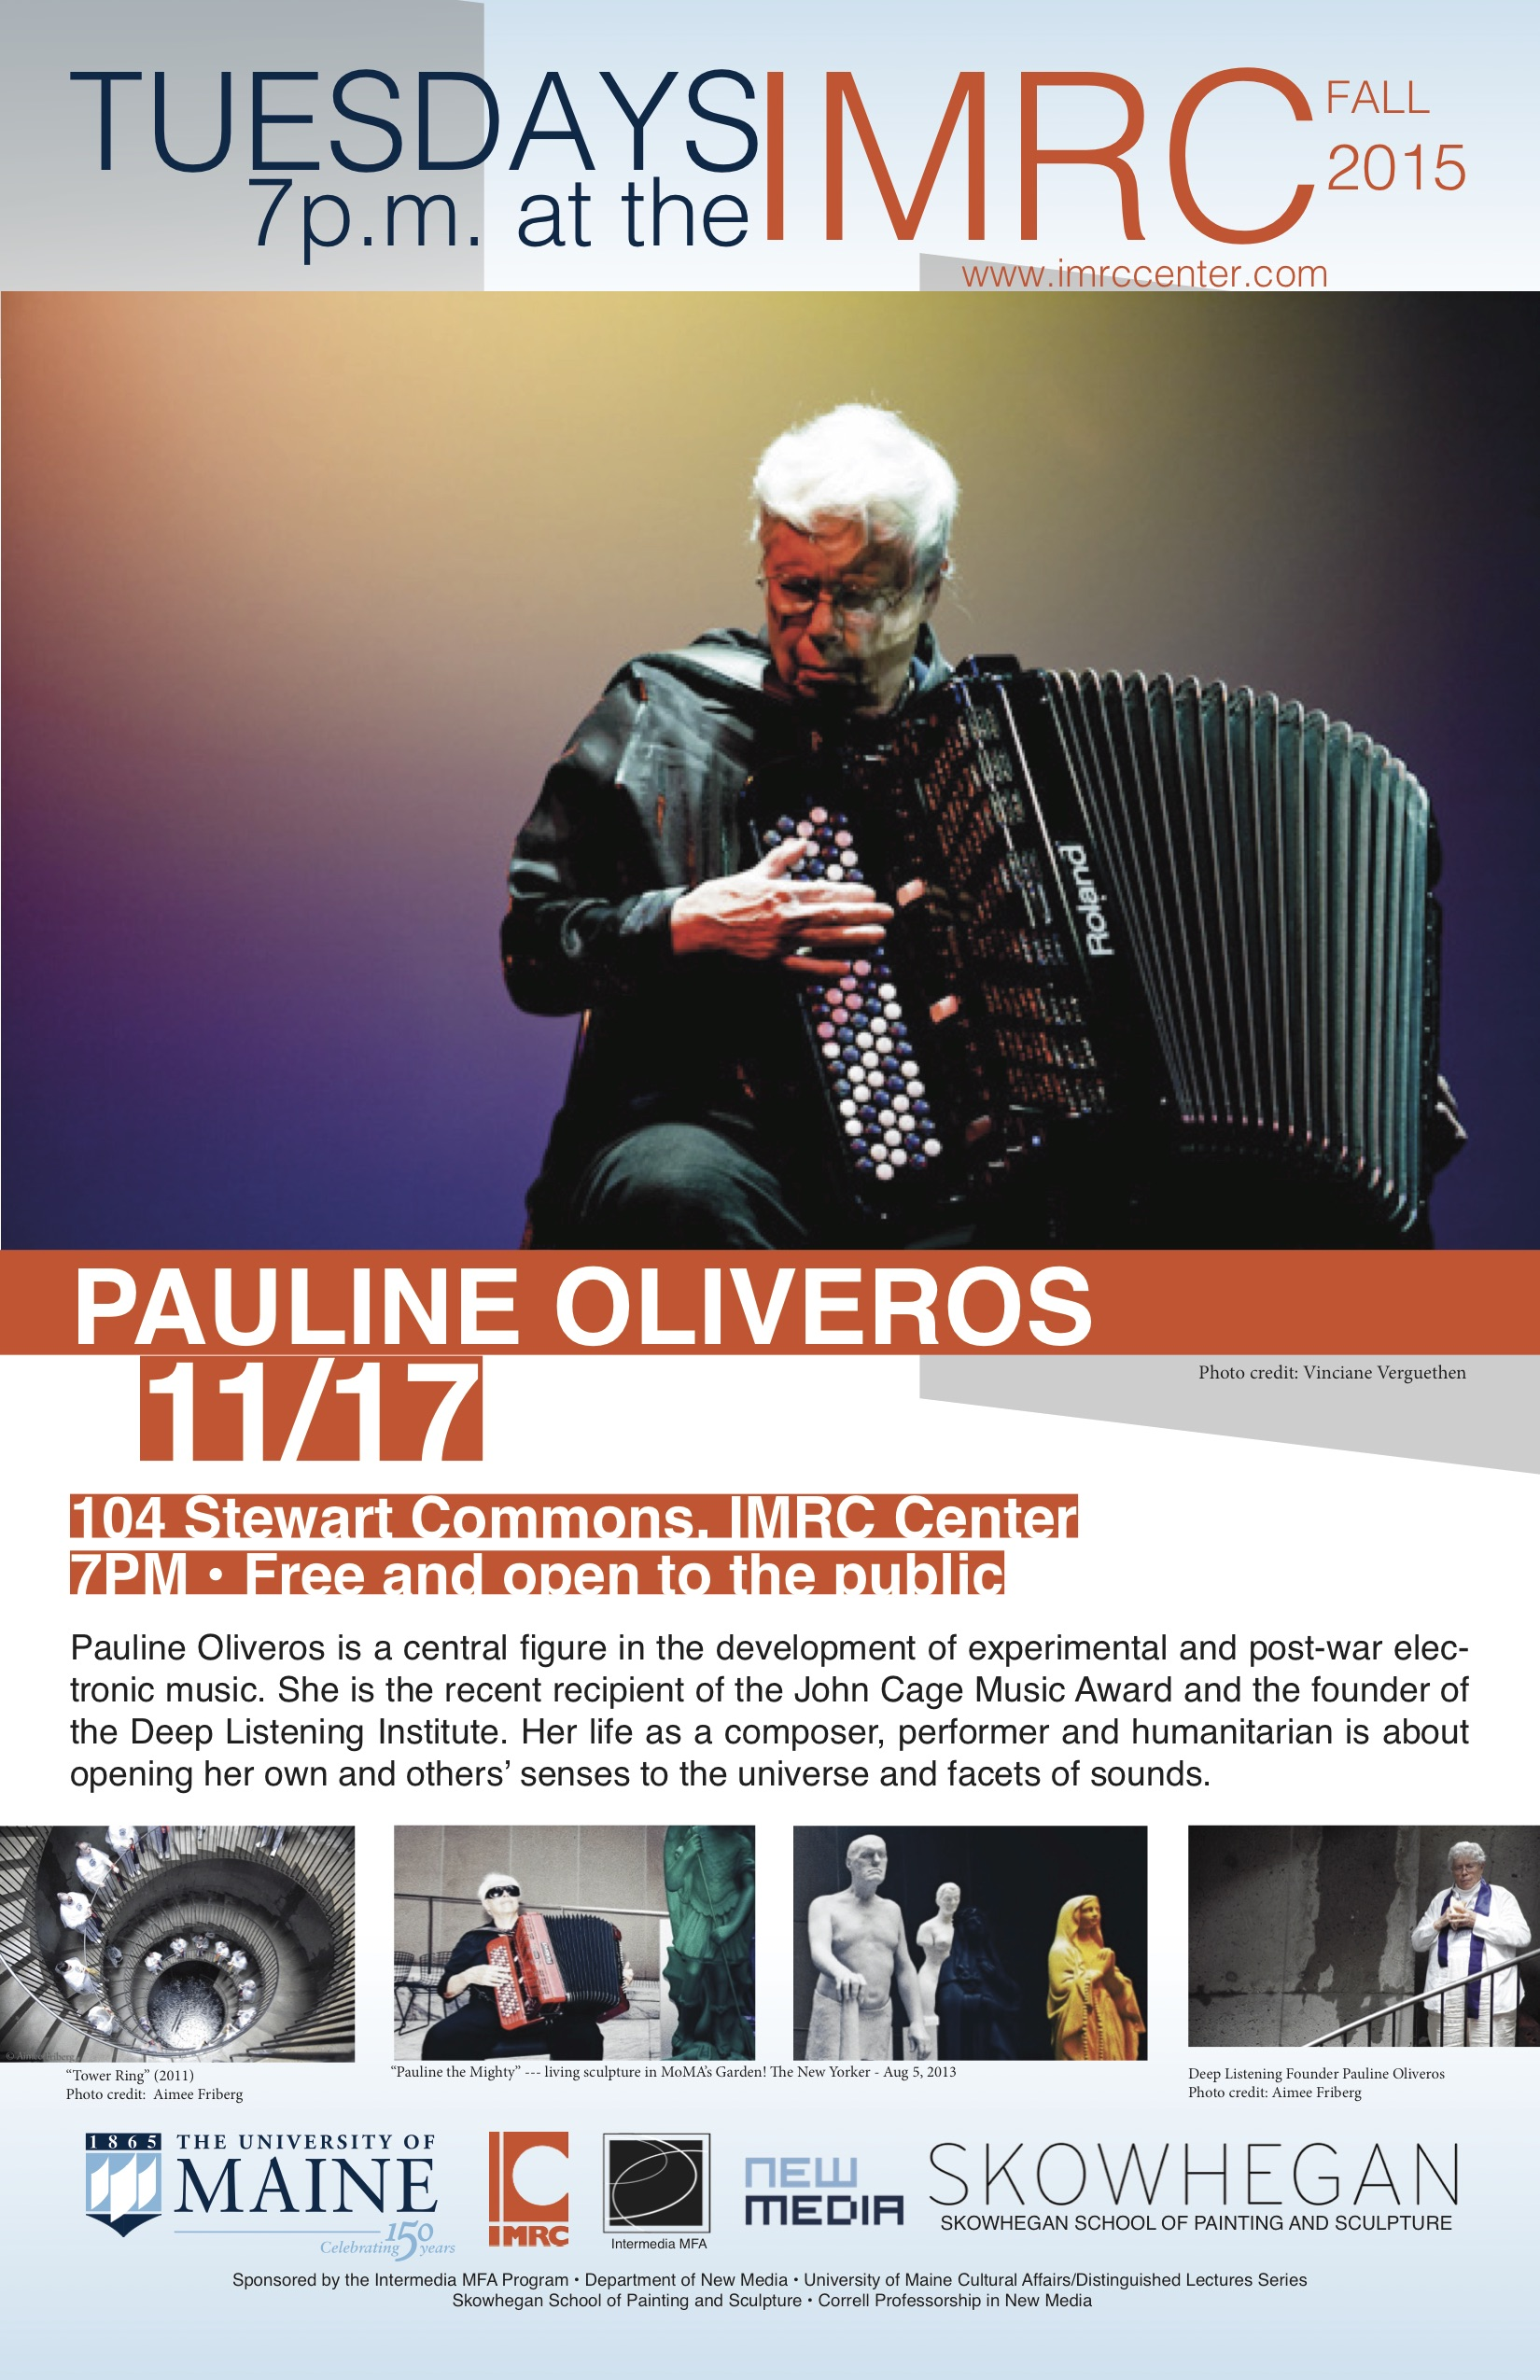 7_Pauline Oliveros_Poster.jpg